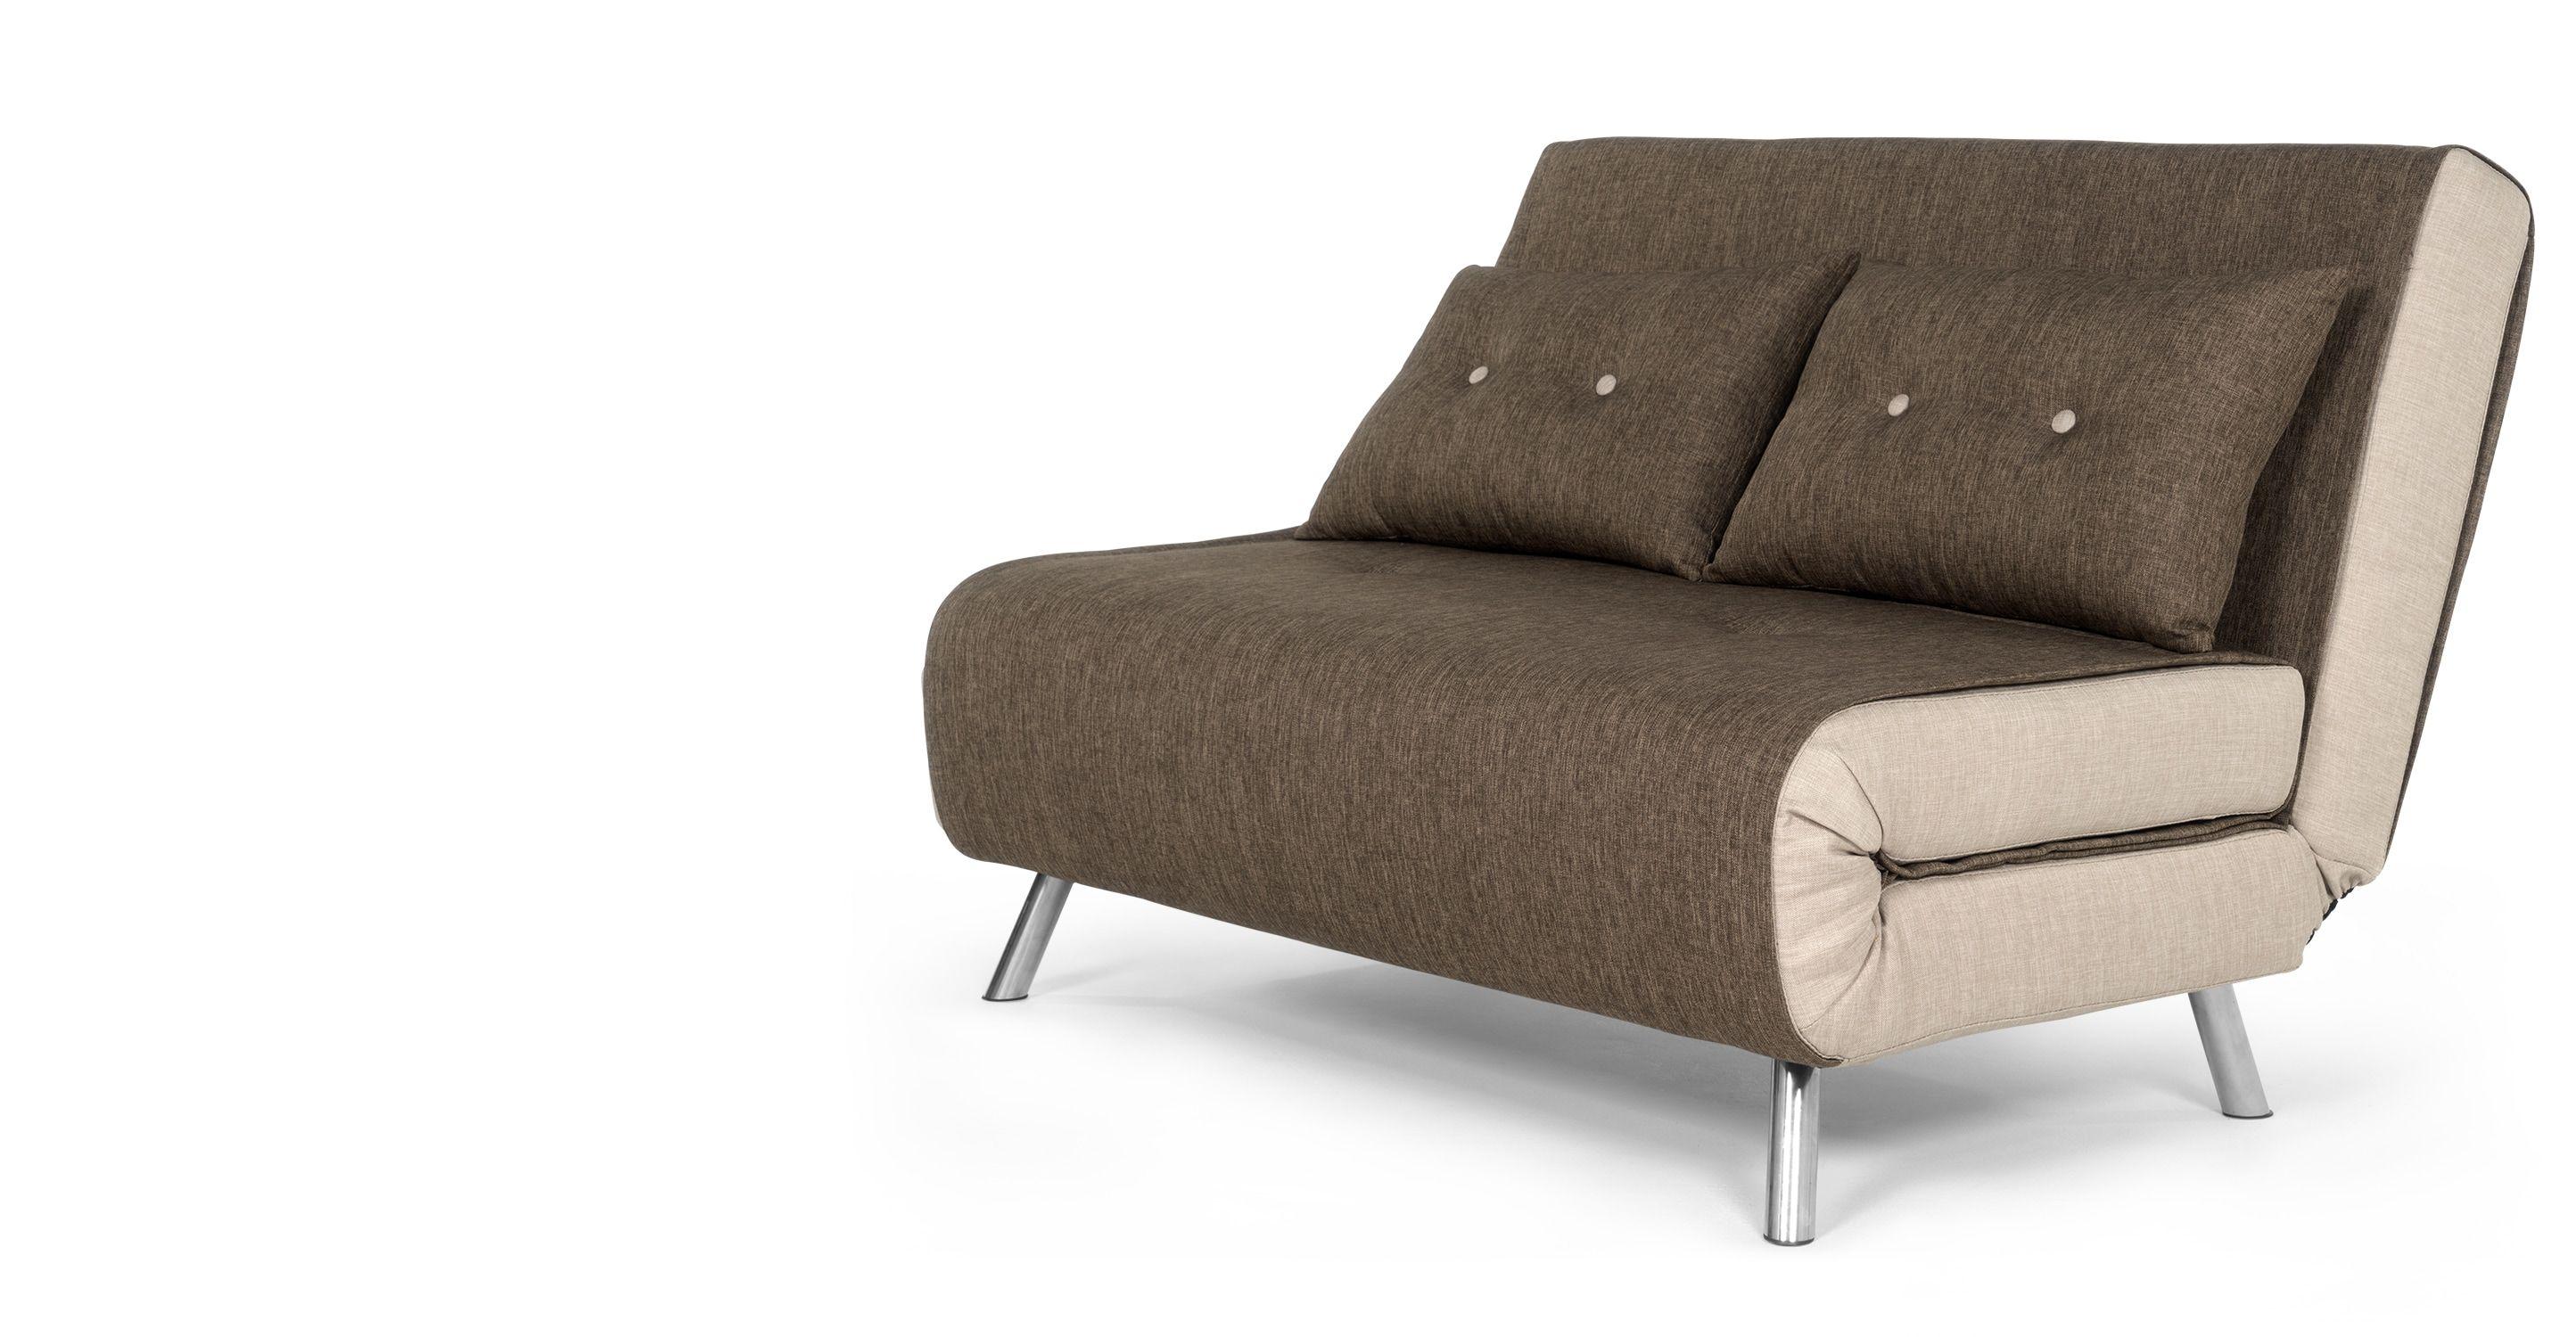 Slaapbank Design Outlet.Haru Kleine Slaapbank Bosbruin Petit Canape Convertible Petit